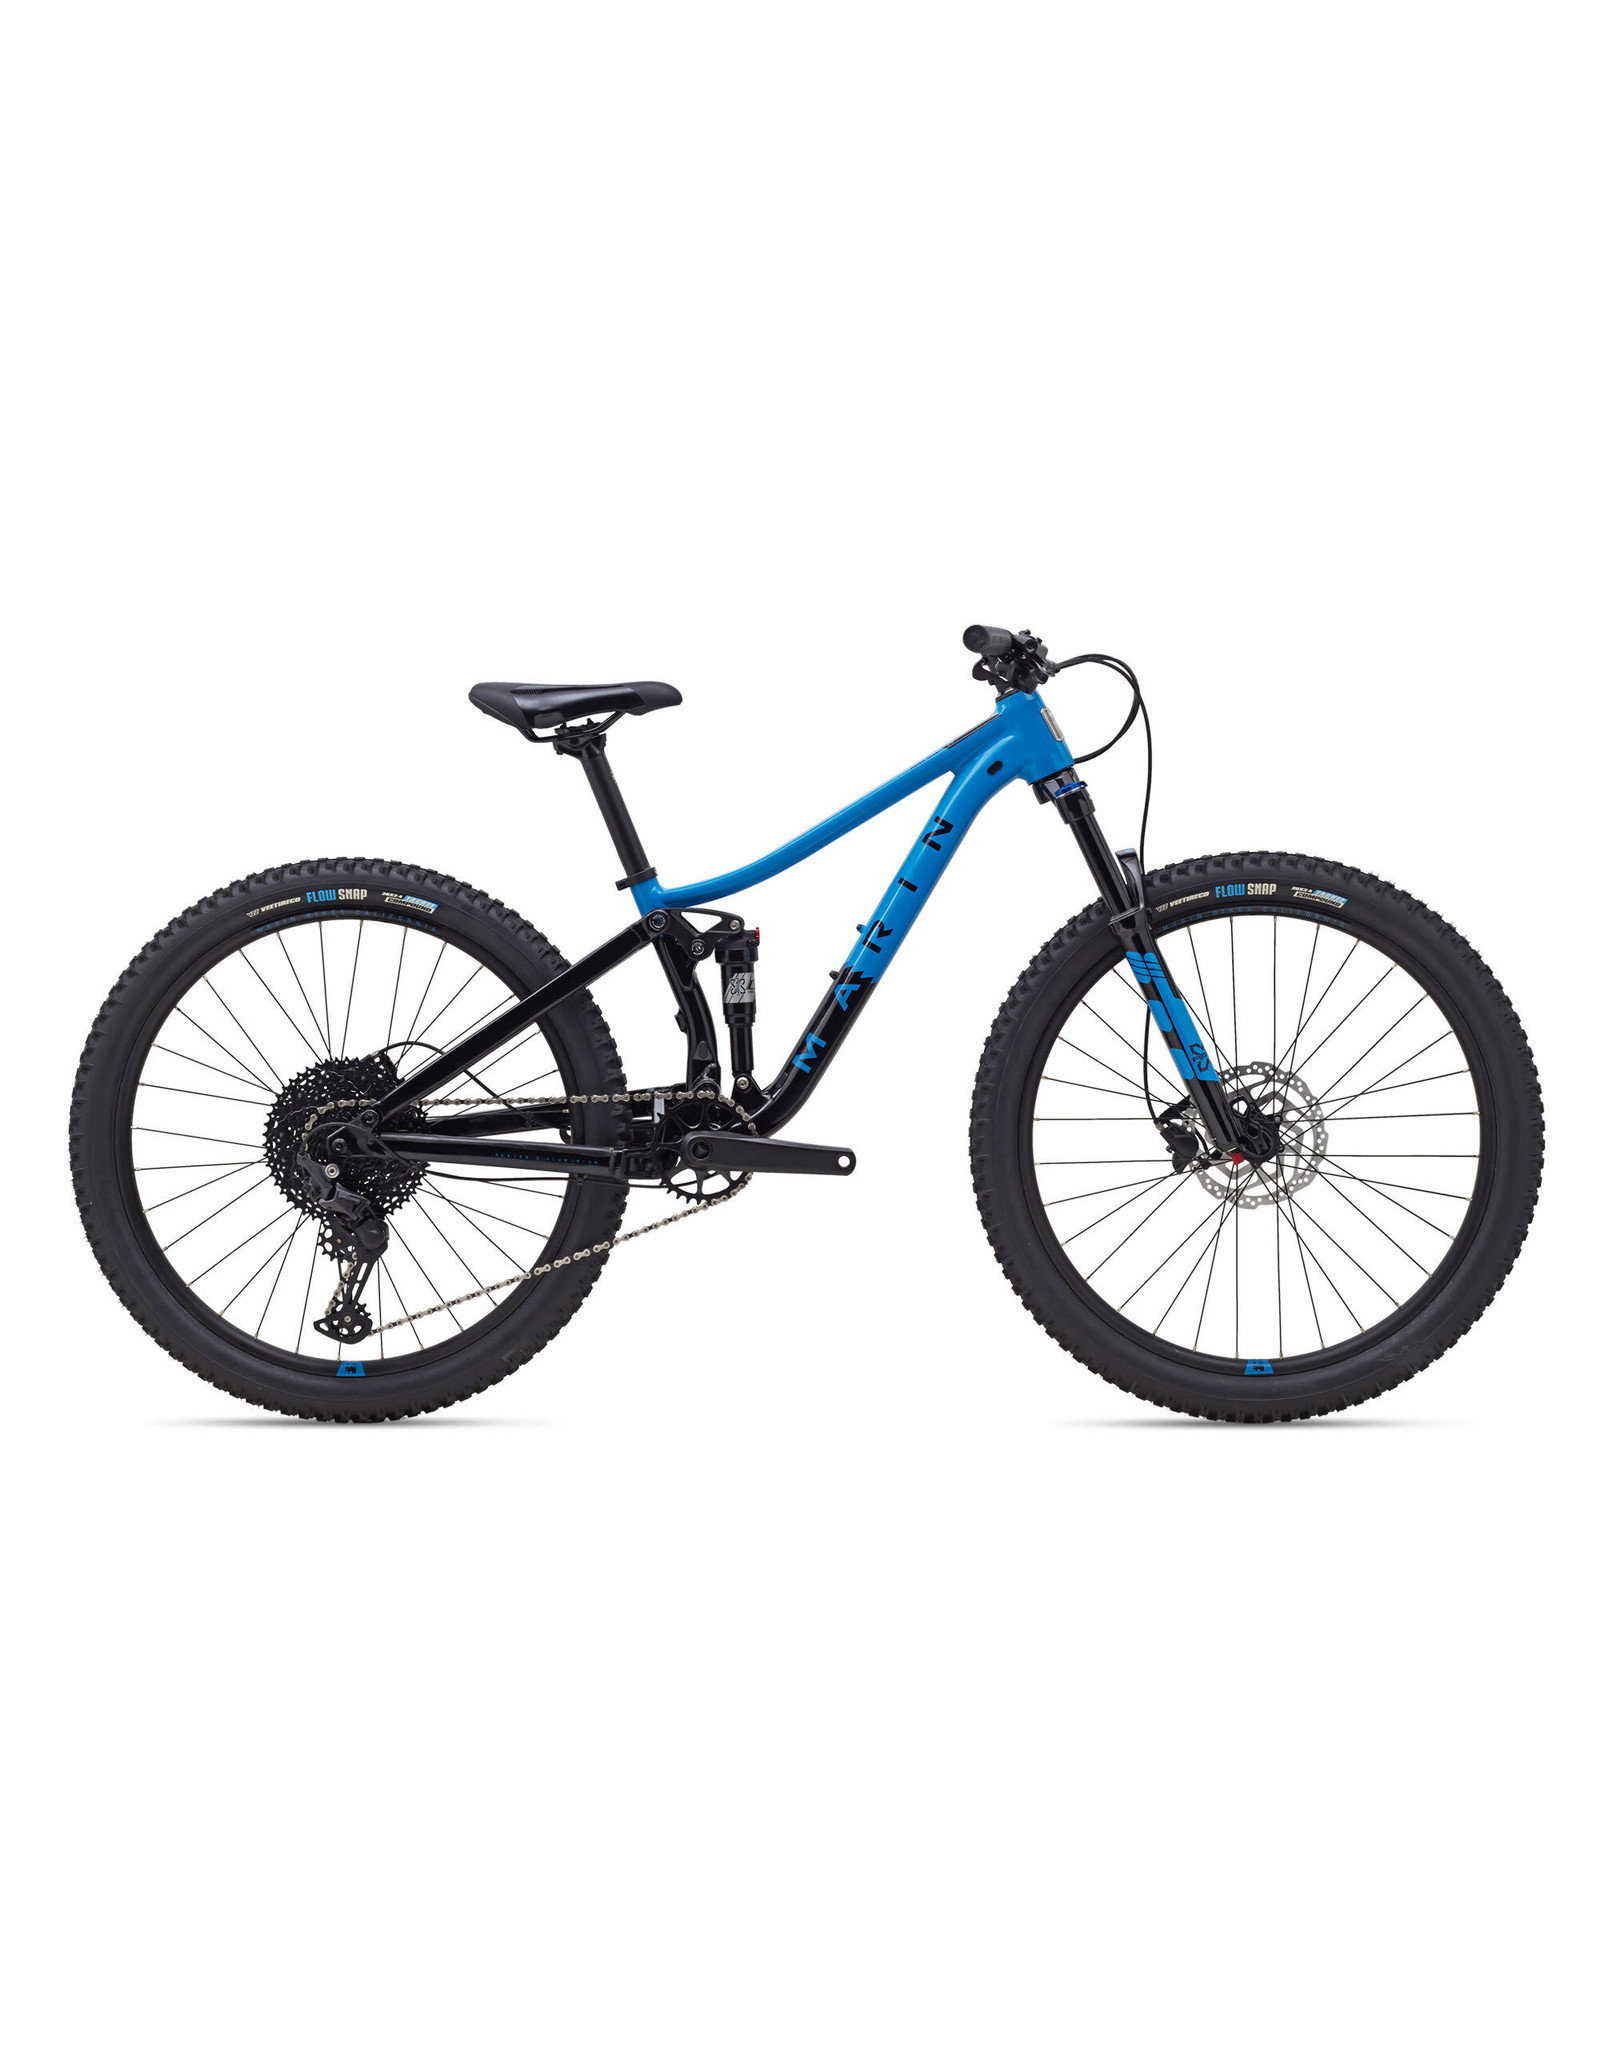 "Marin Bikes 2022 Marin Rift Zone Jr. 24"" Black/Blue"